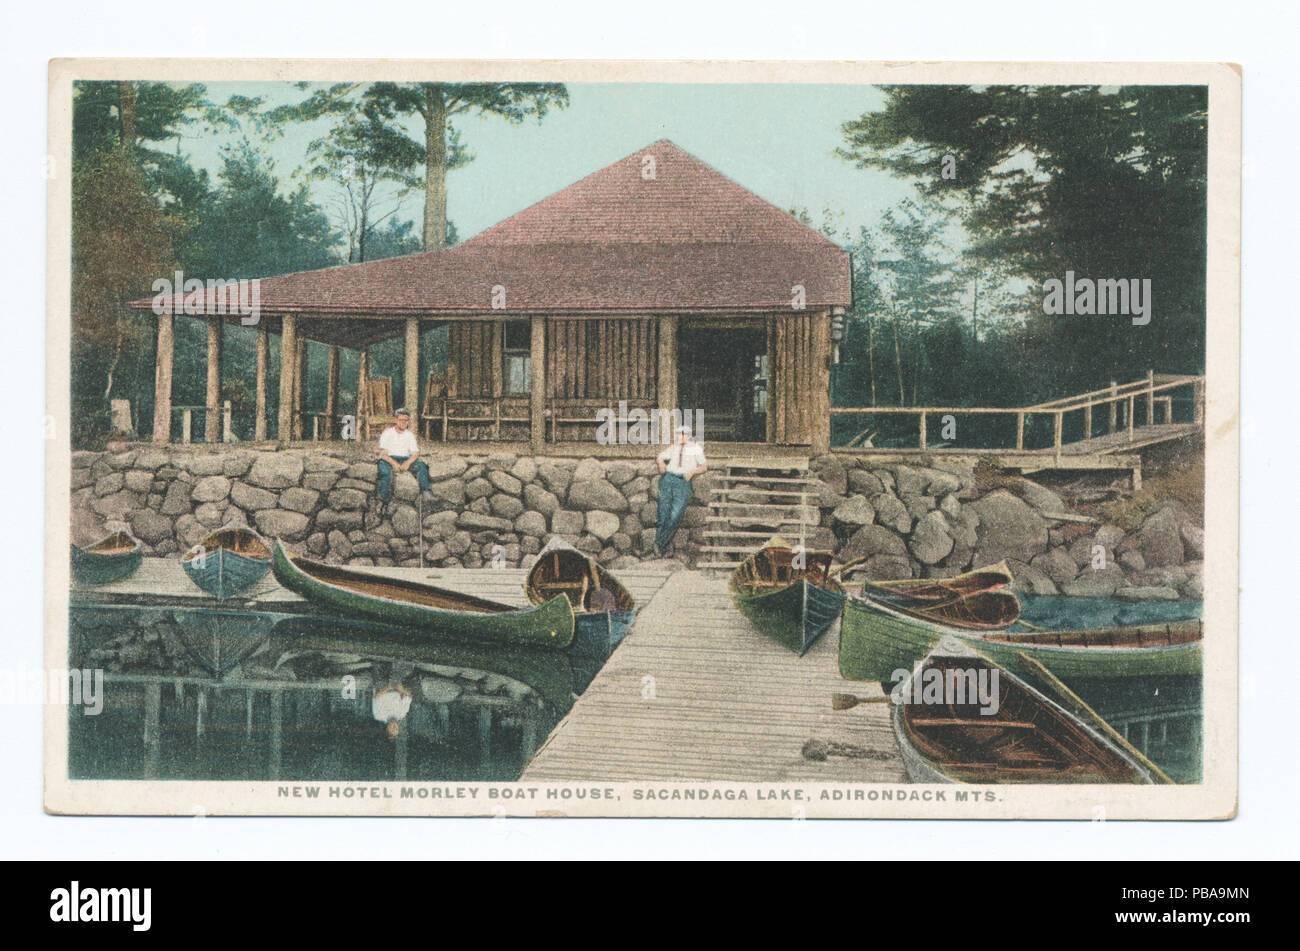 1094 New Hotel Morley Boat House, Sacandaga Lake, Adirondack Mts (NYPL b12647398-79467) - Stock Image